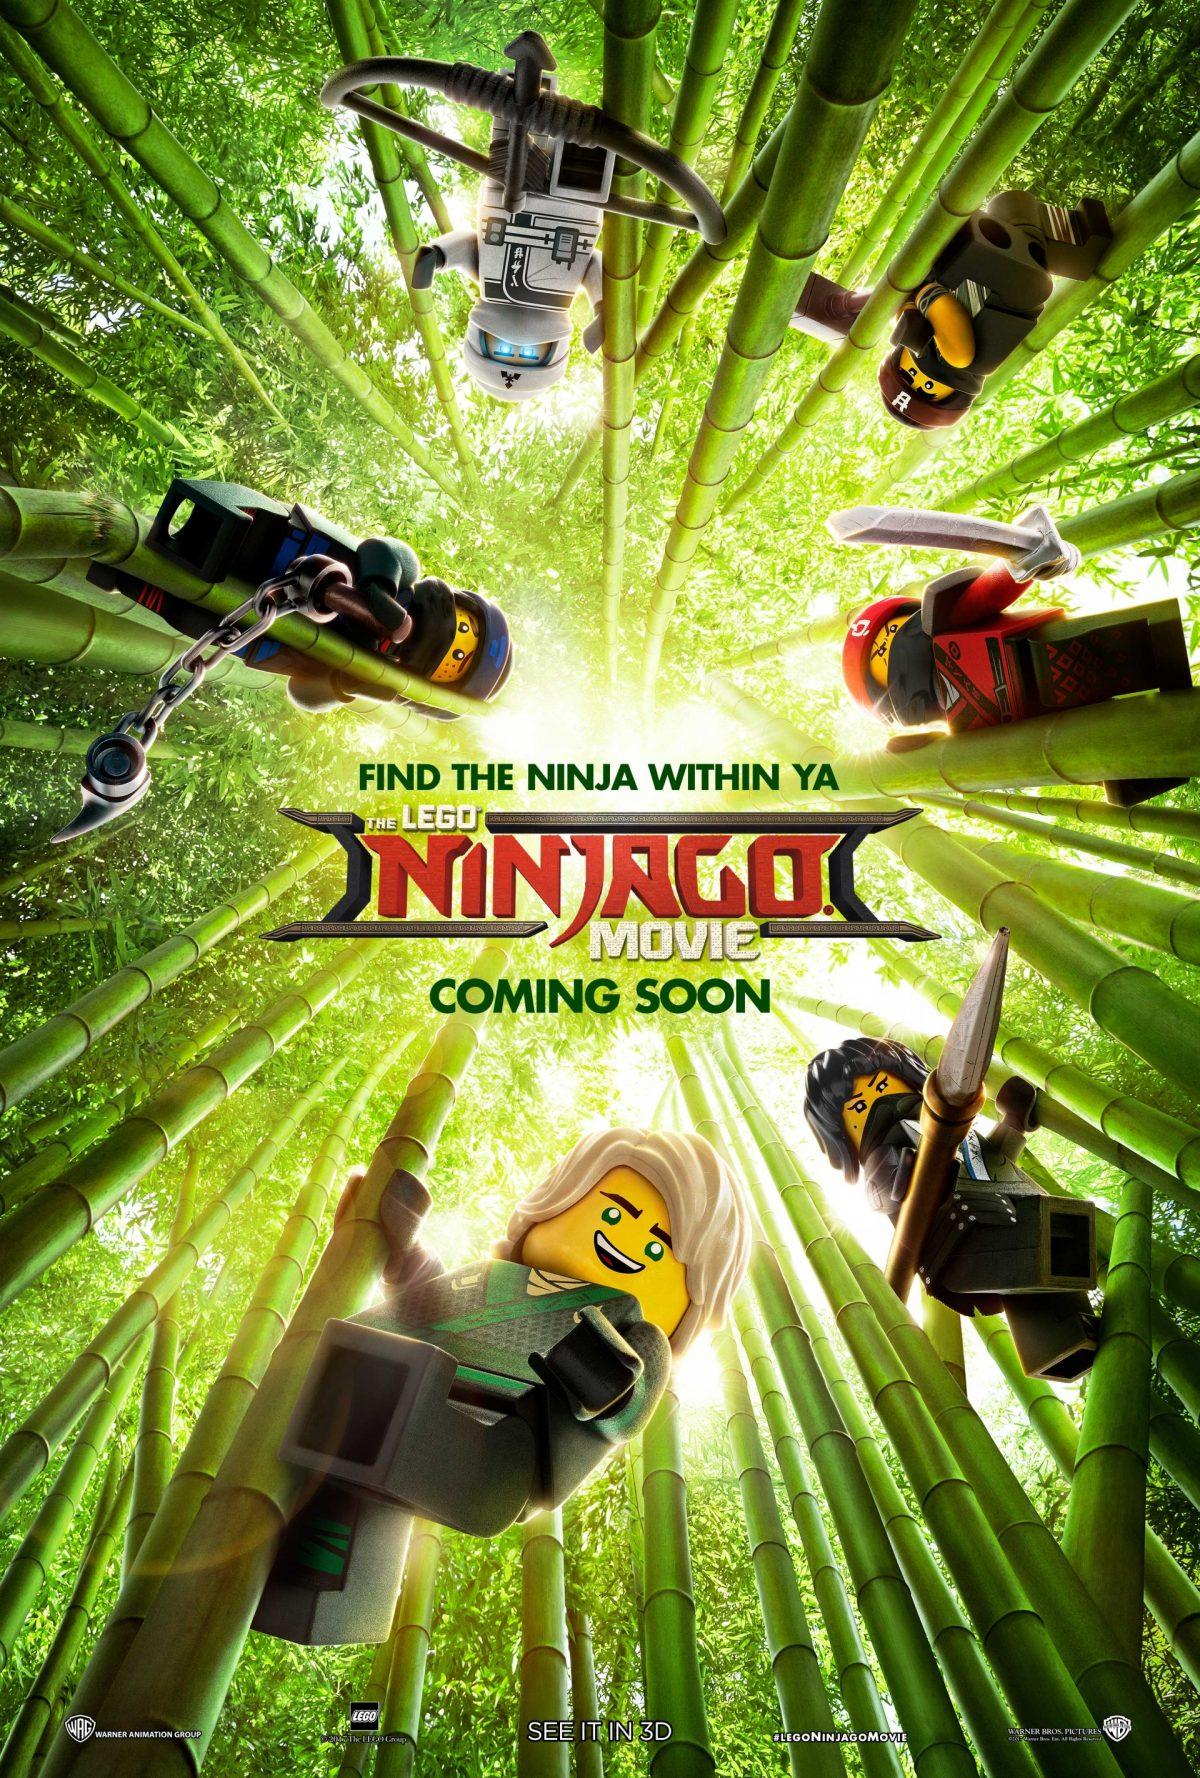 #Win a #TheLEGOMoviesUK #LEGONINJAGOMovie Merchandise goodie pack